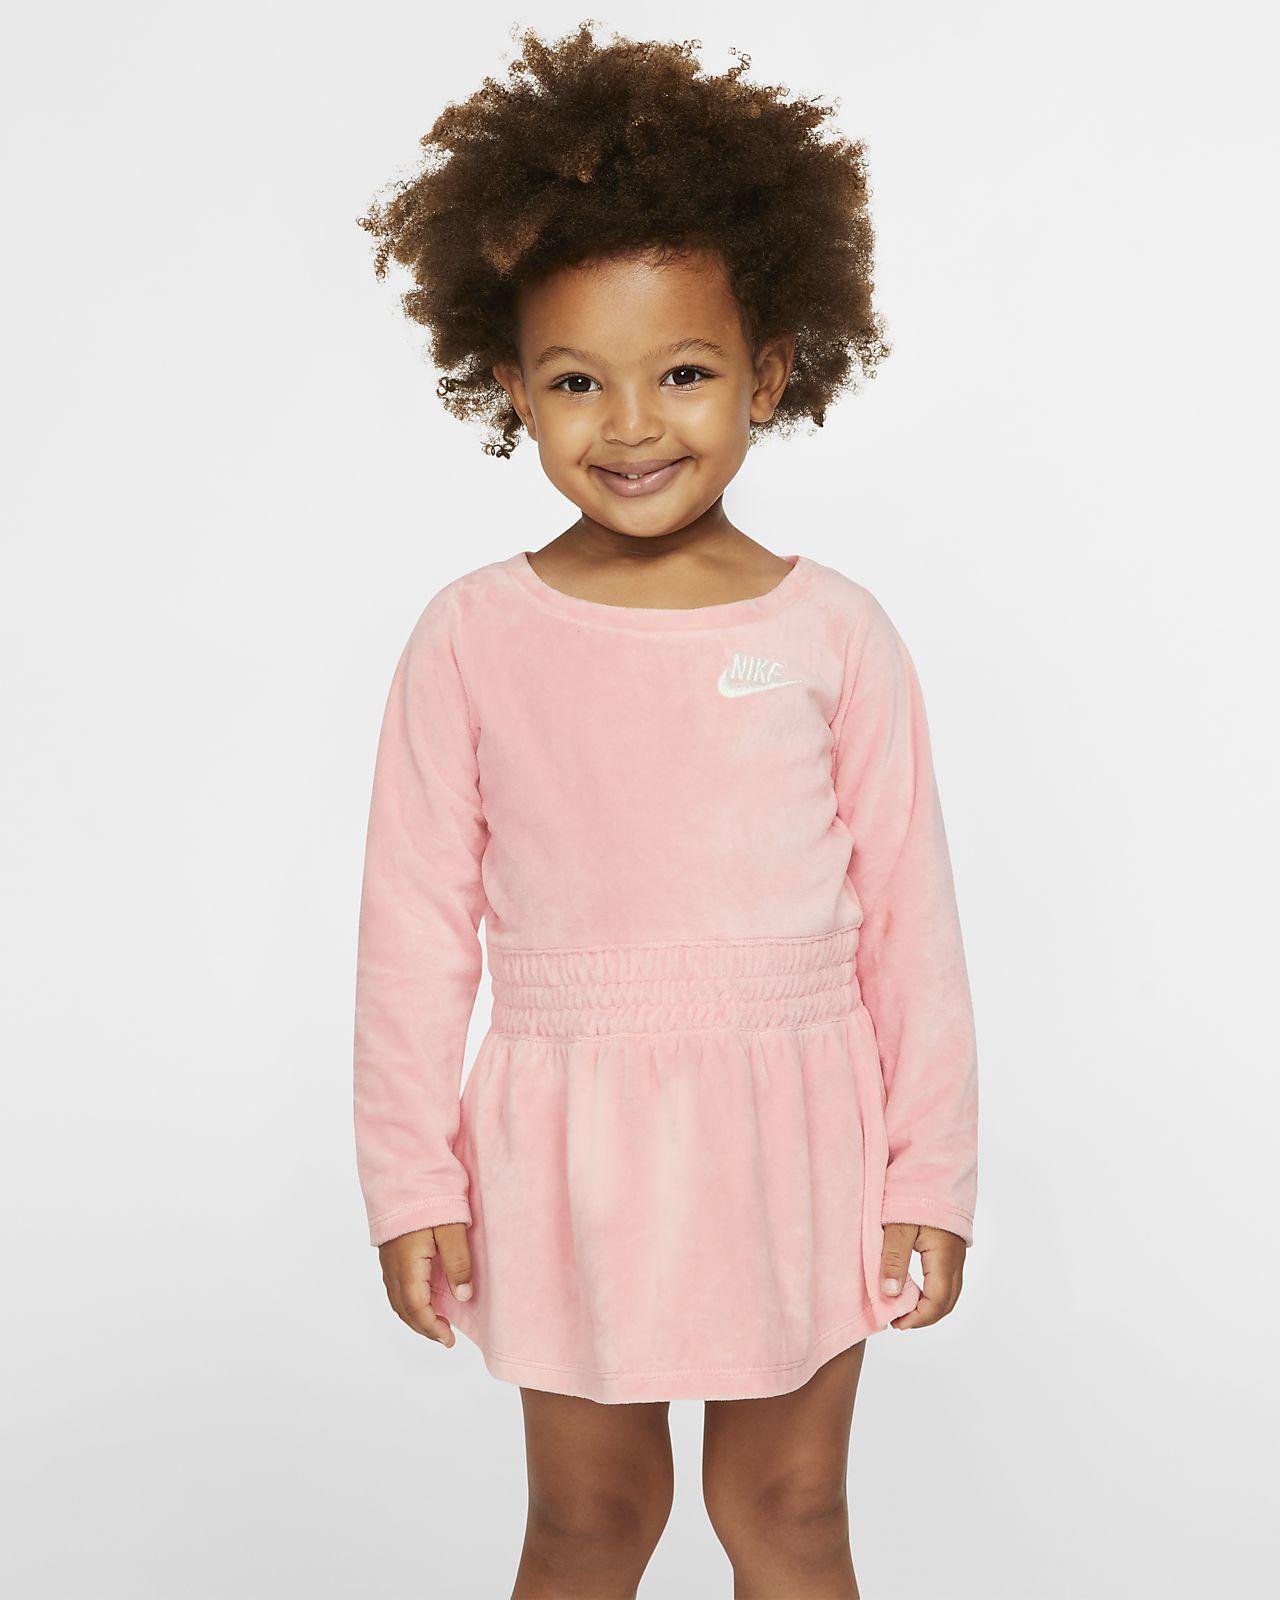 Nike Sportswear Toddler Long-Sleeve Velour Dress